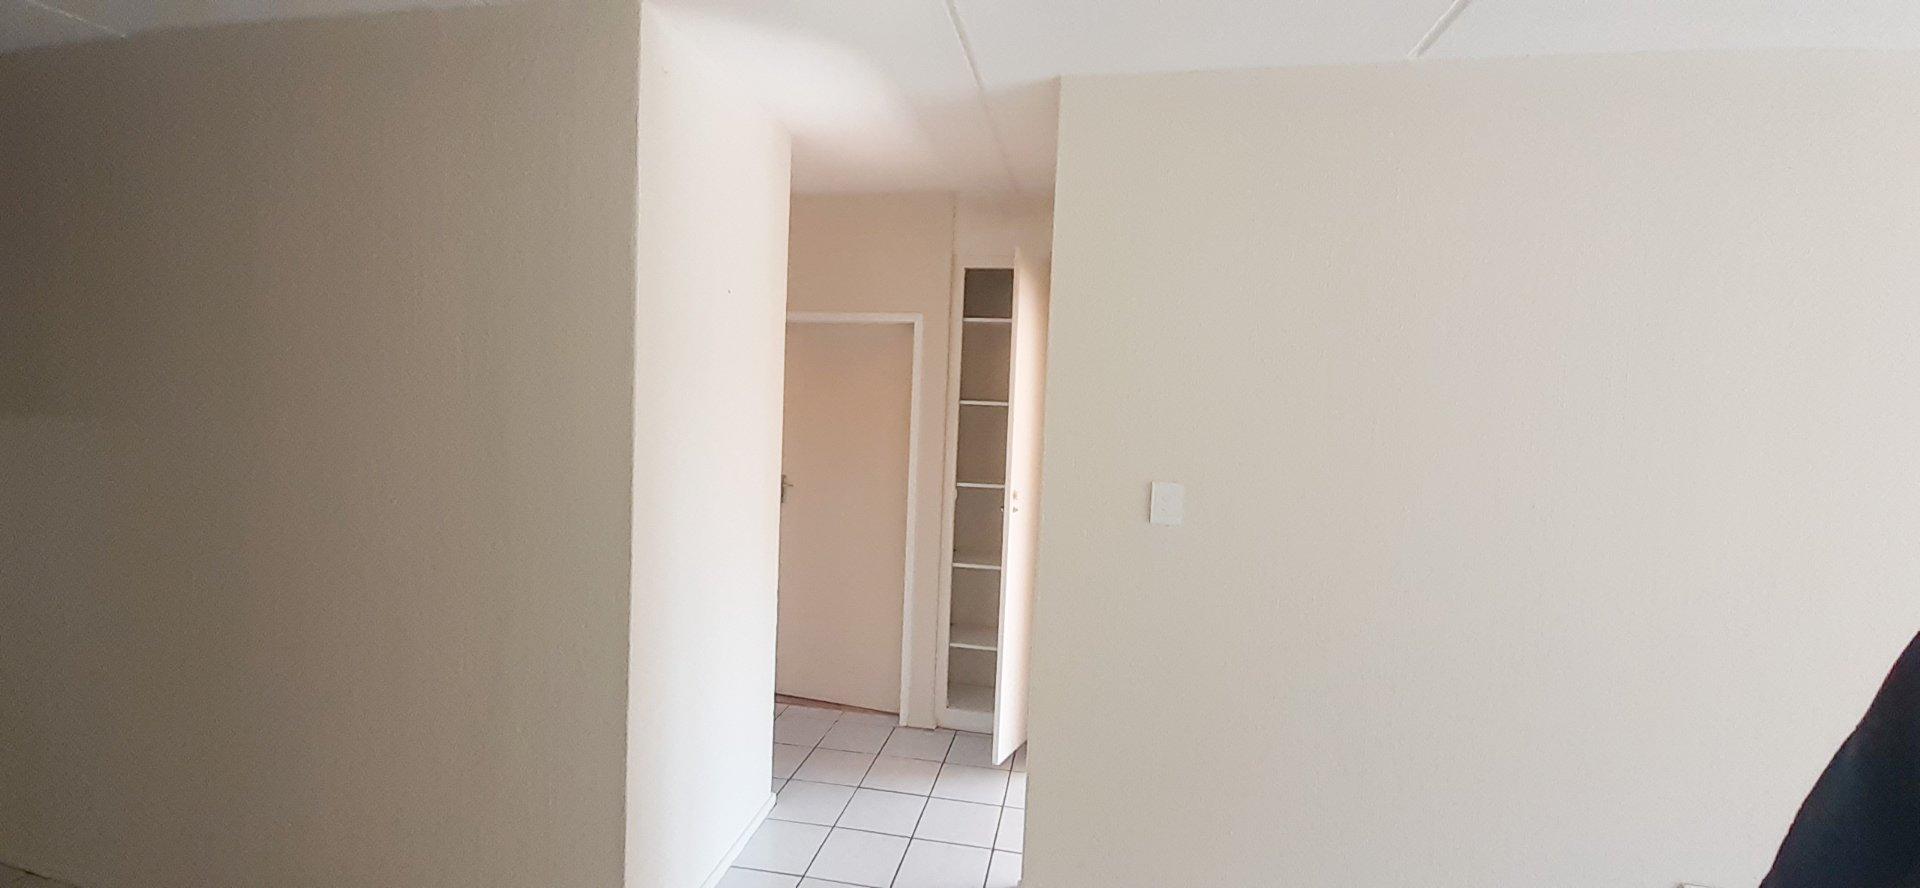 Apartment Rental Monthly in Vorna Valley